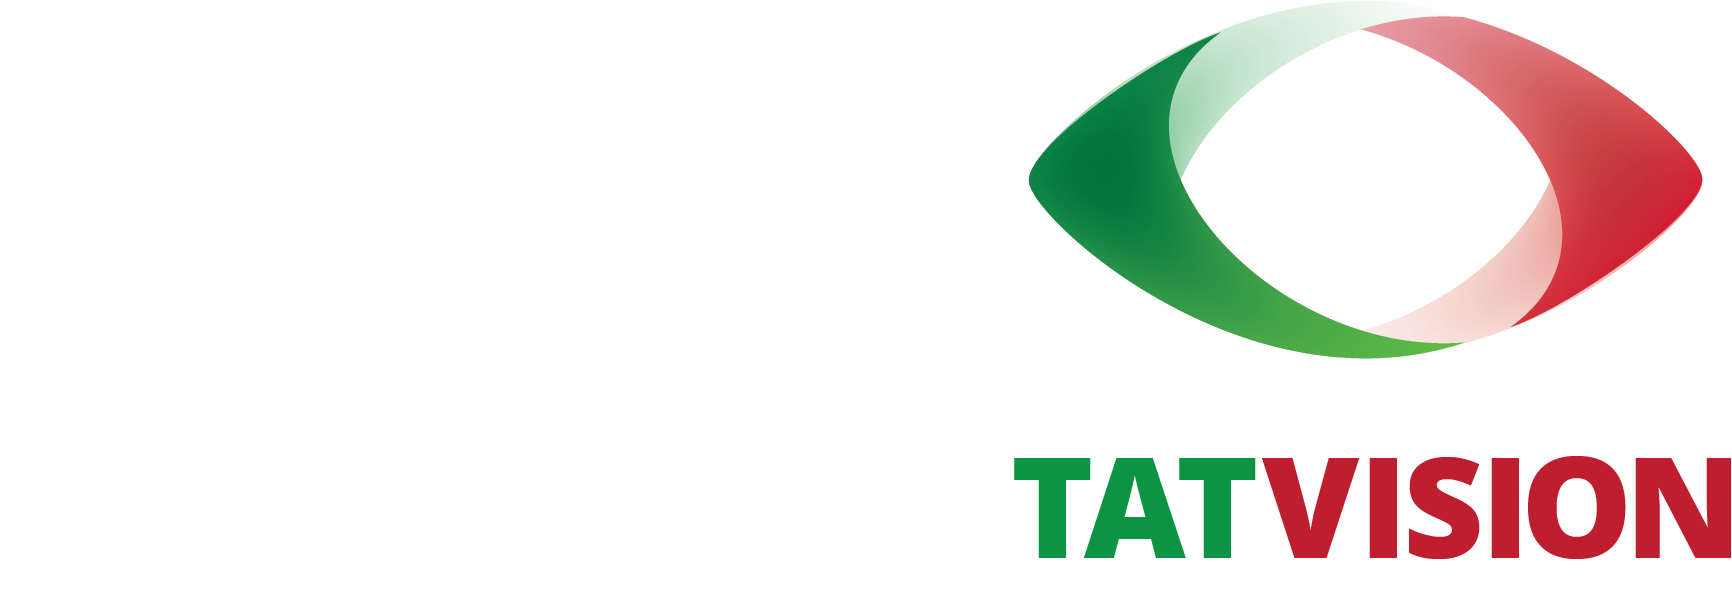 Татвижн